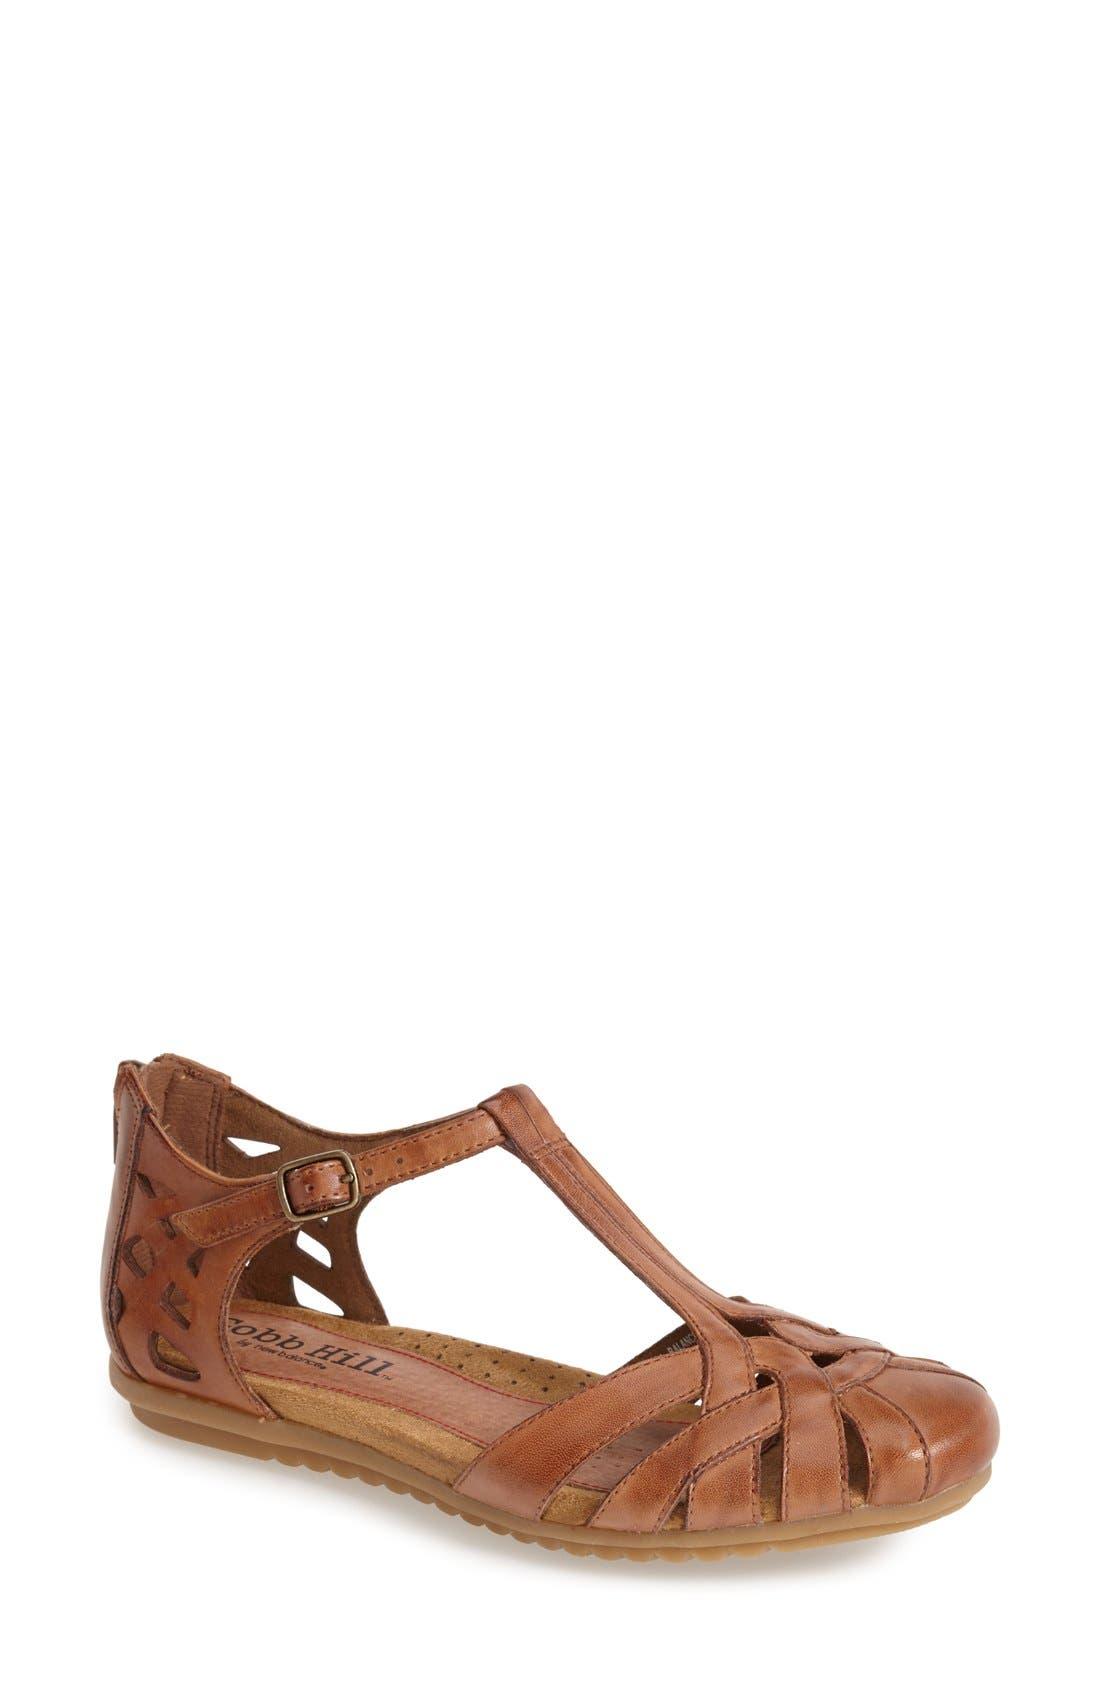 'Ireland' Leather Sandal,                             Main thumbnail 1, color,                             TAN